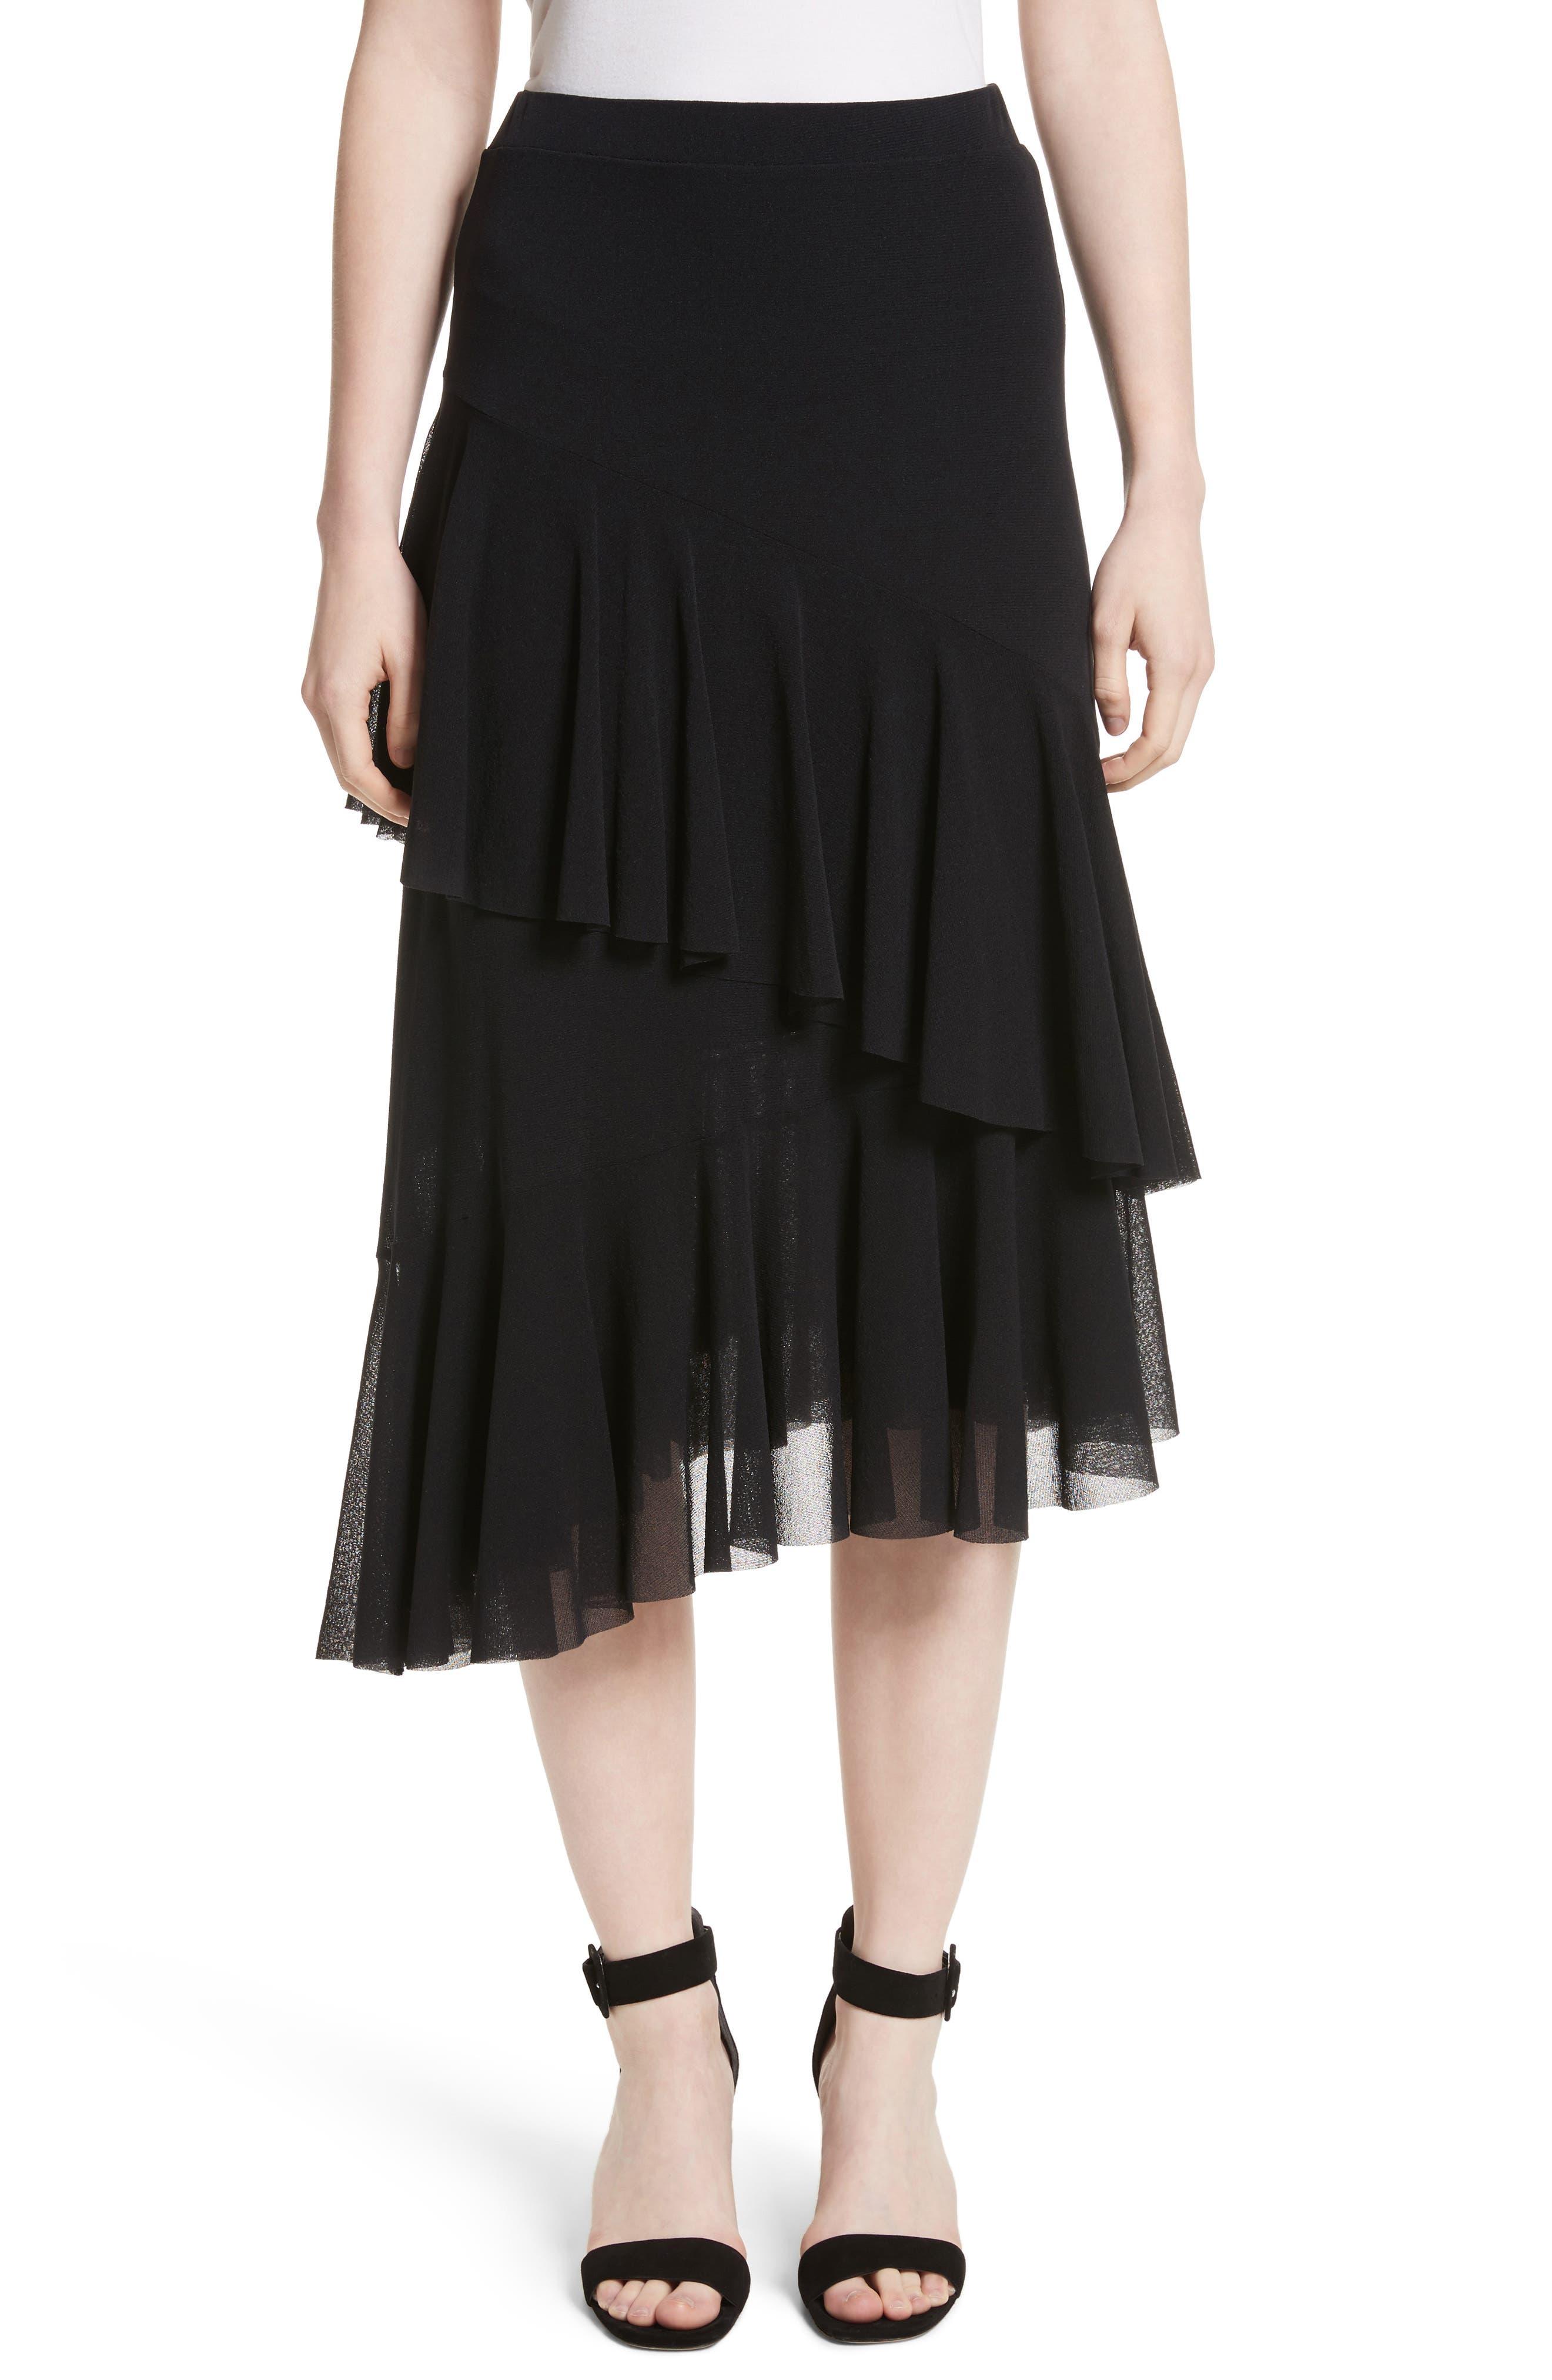 Alternate Image 1 Selected - Fuzzi Ruffle Tulle Midi Skirt